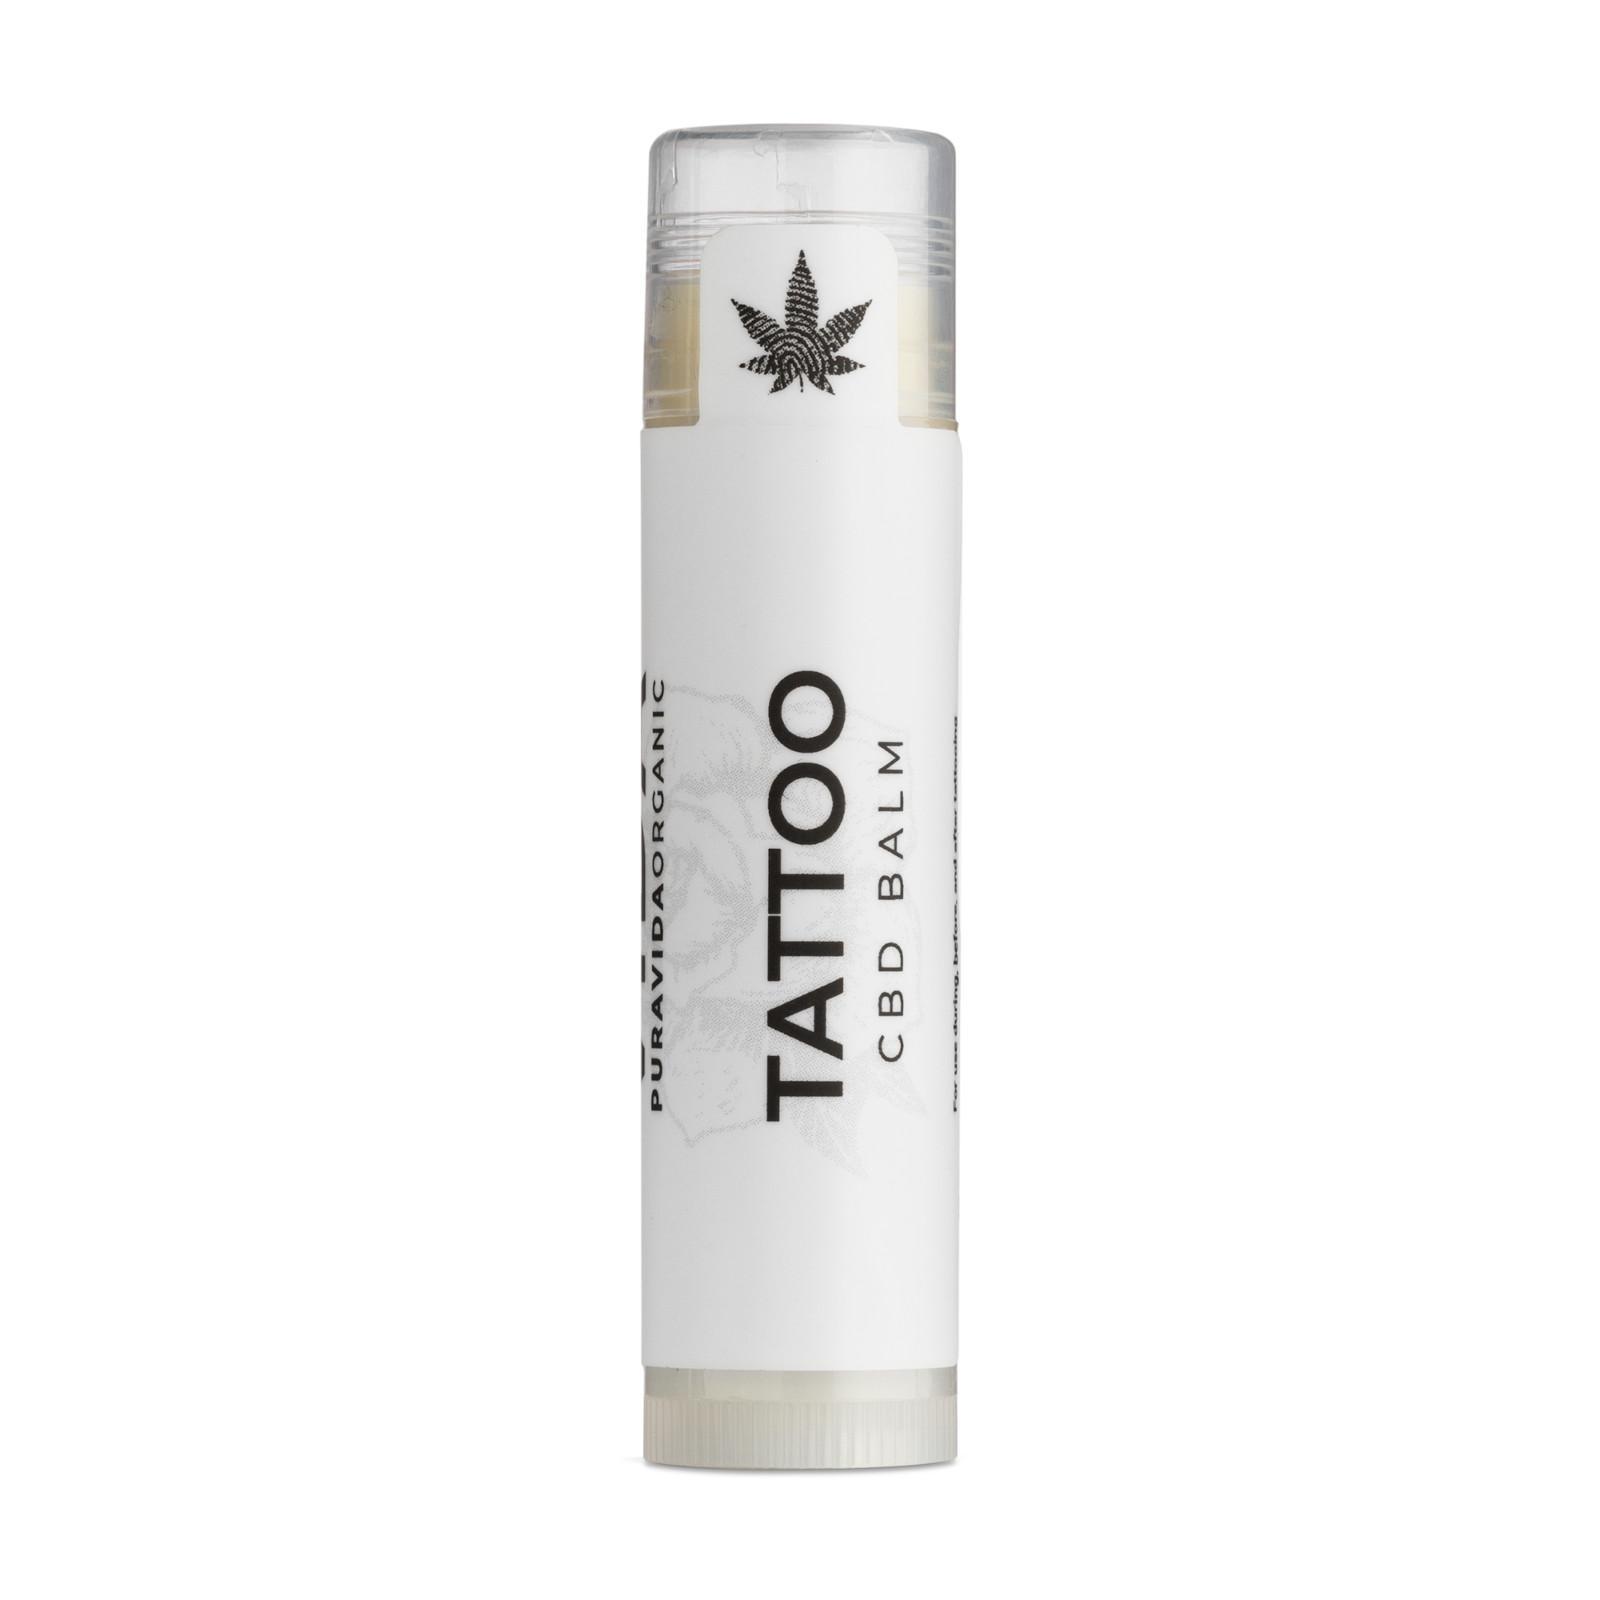 Pura Vida Organic CBD Balzám, Tattoo, 15 mg 5 ml